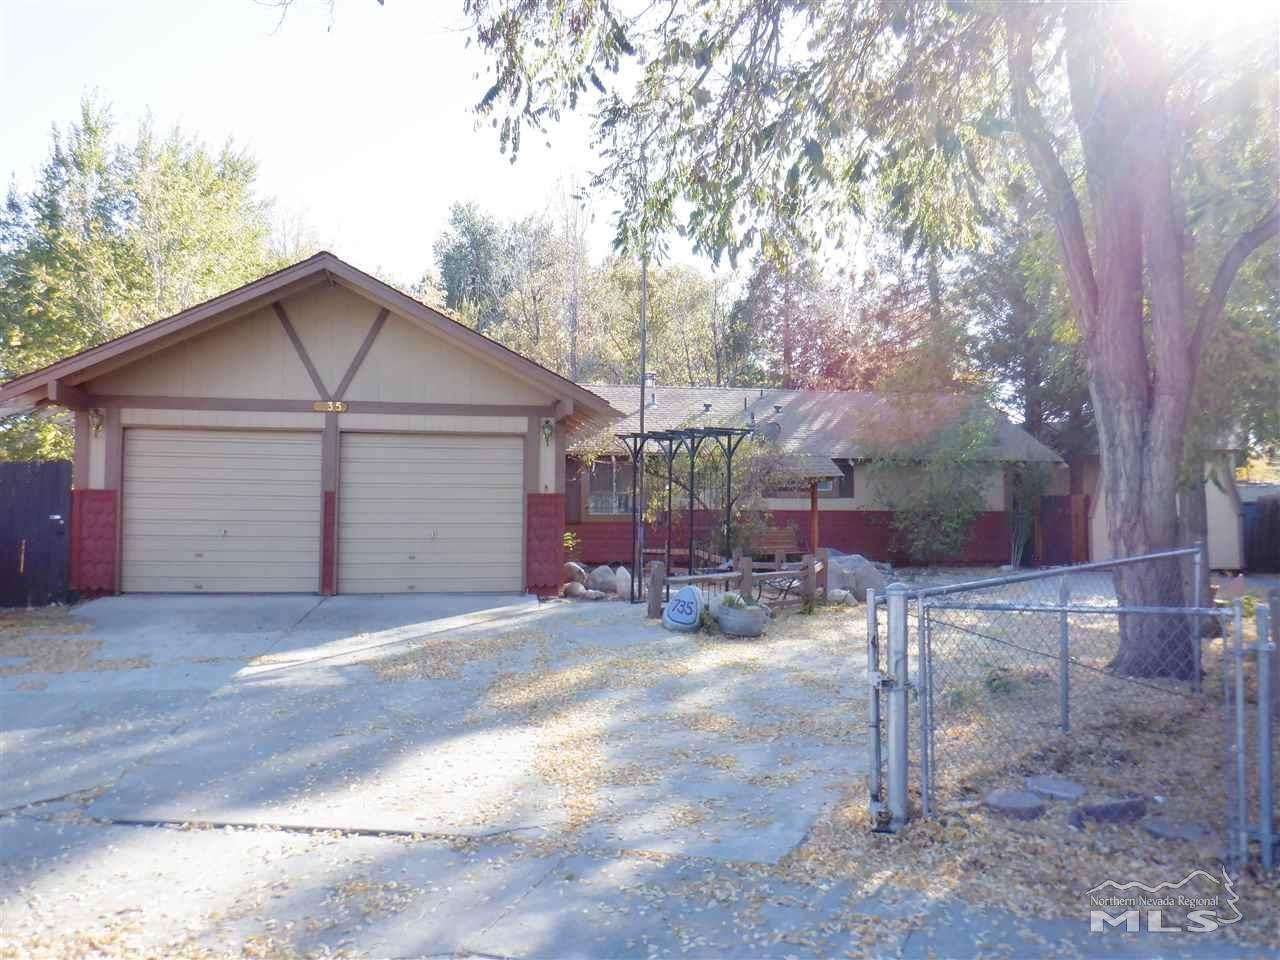 735 Sage View Drive - Photo 1